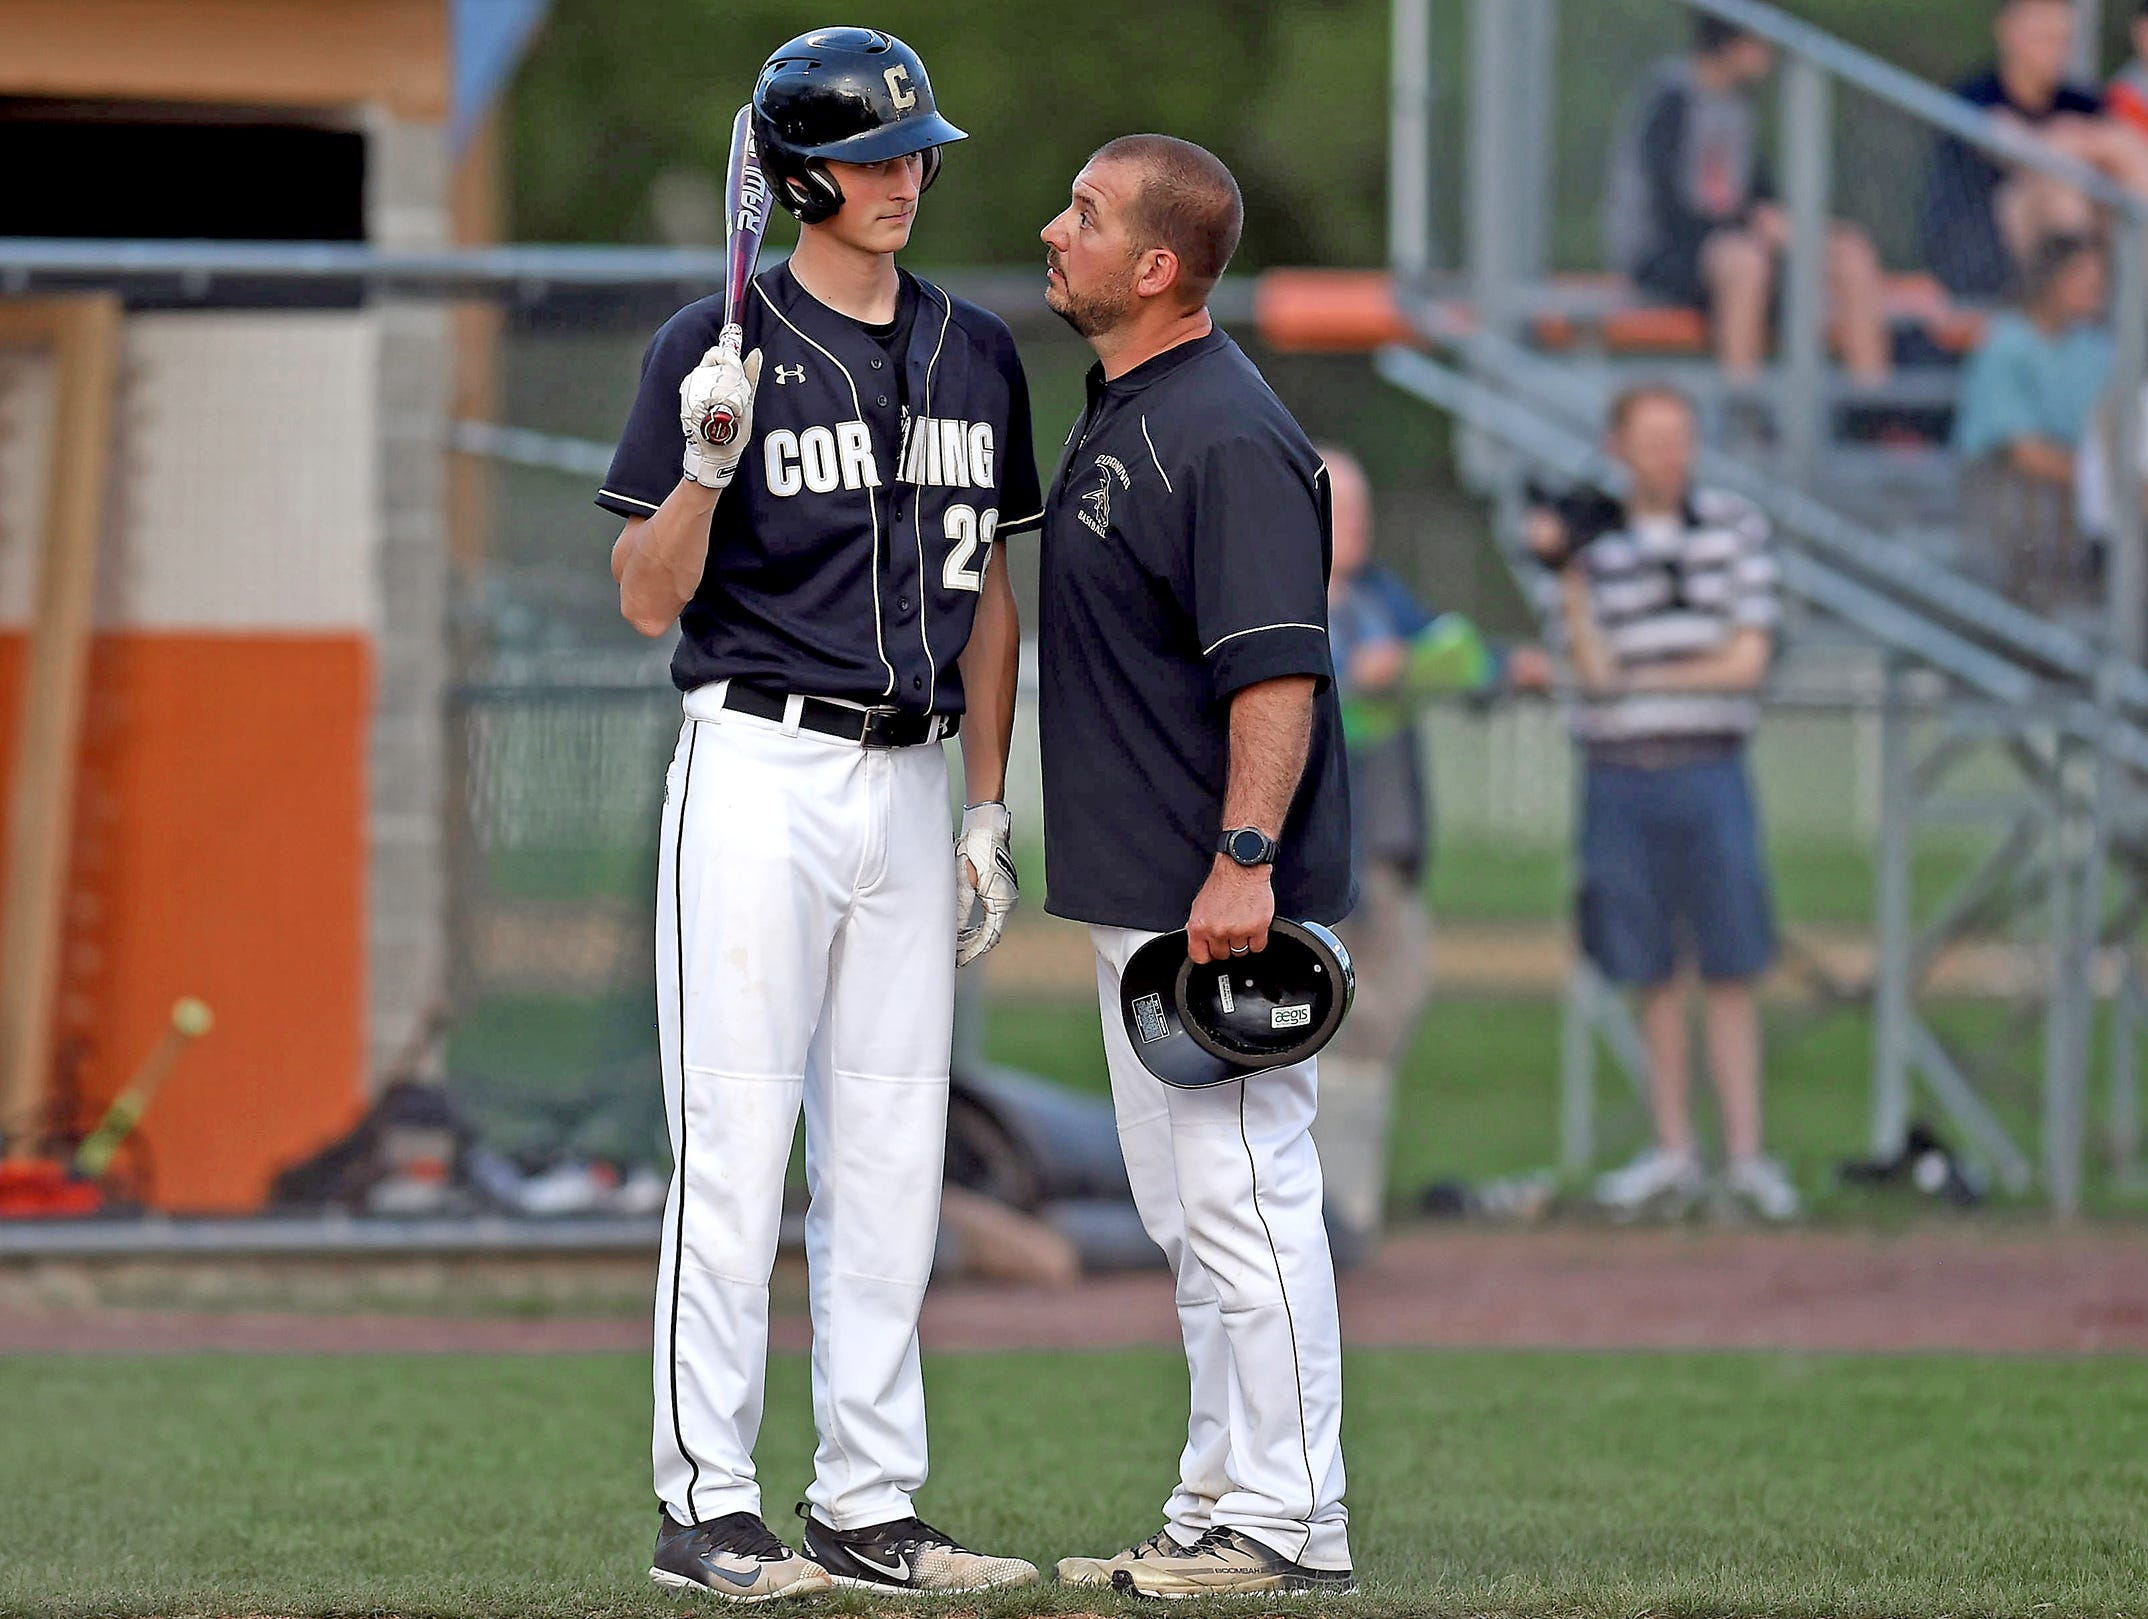 Corning's Kellan Beall (22) and head coach Eric Kizis, STAC high school baseball final, Corning at Union-Endicott, May 14, 2018.